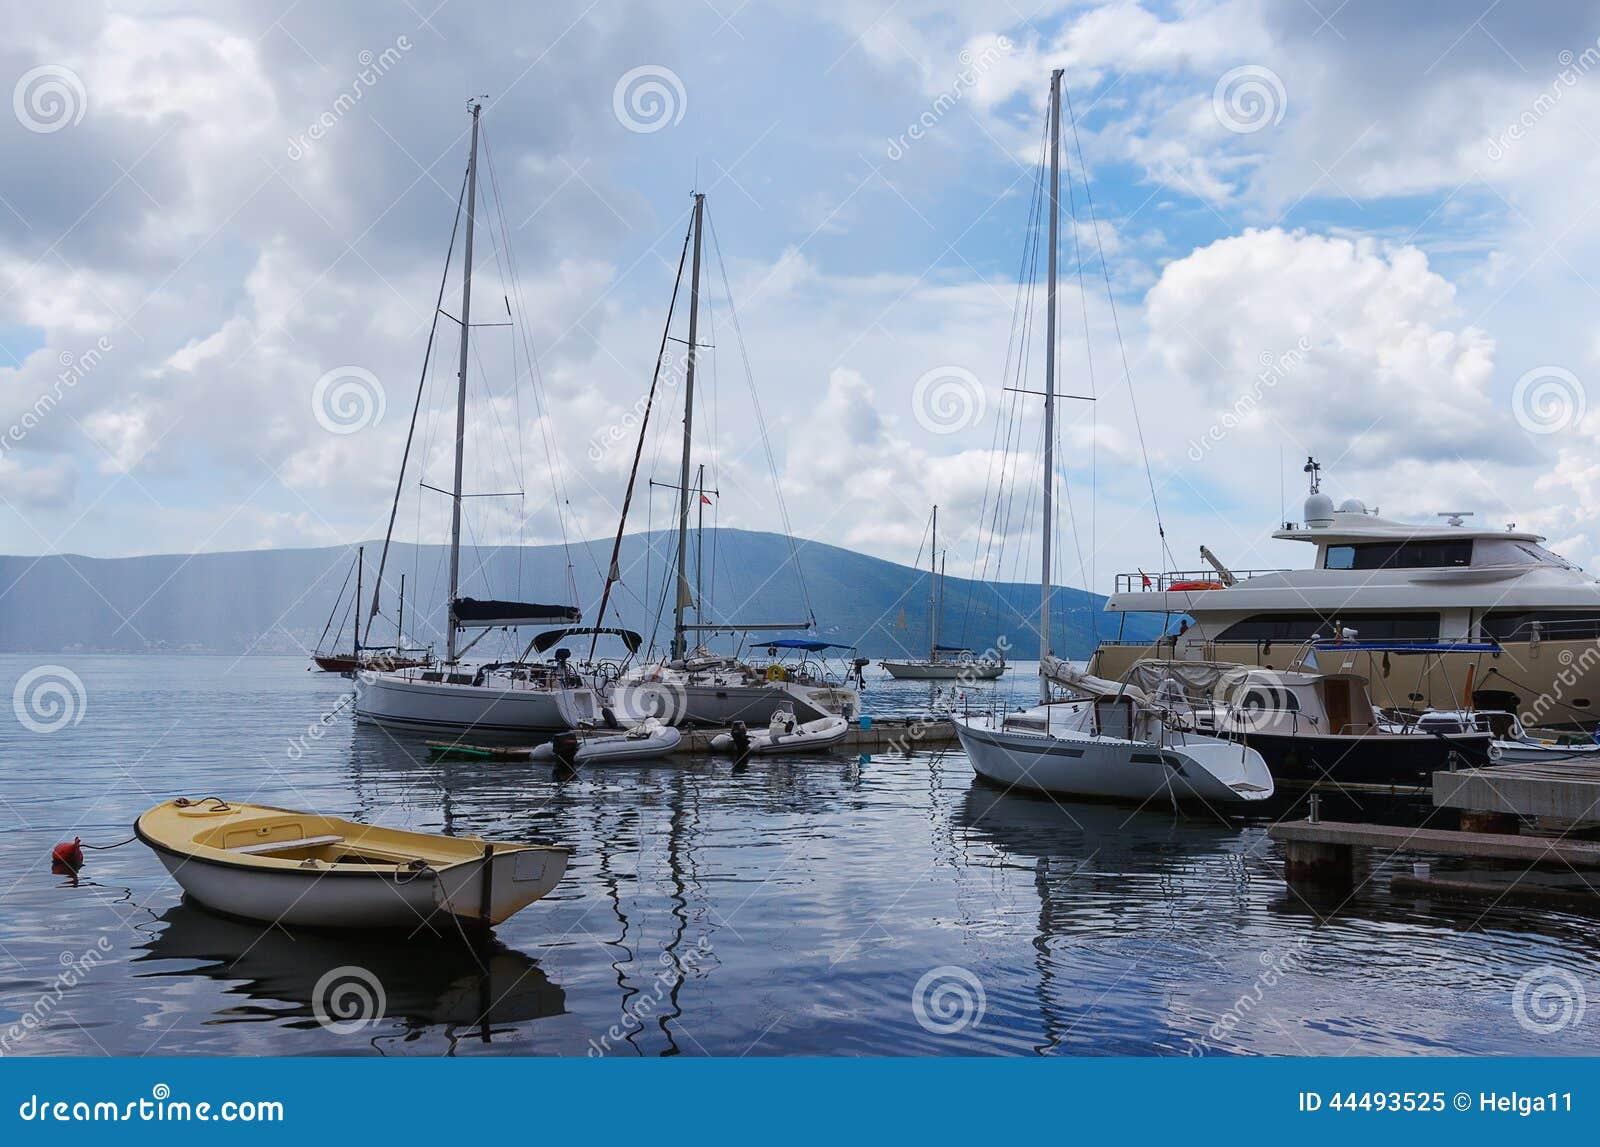 Docked yachts